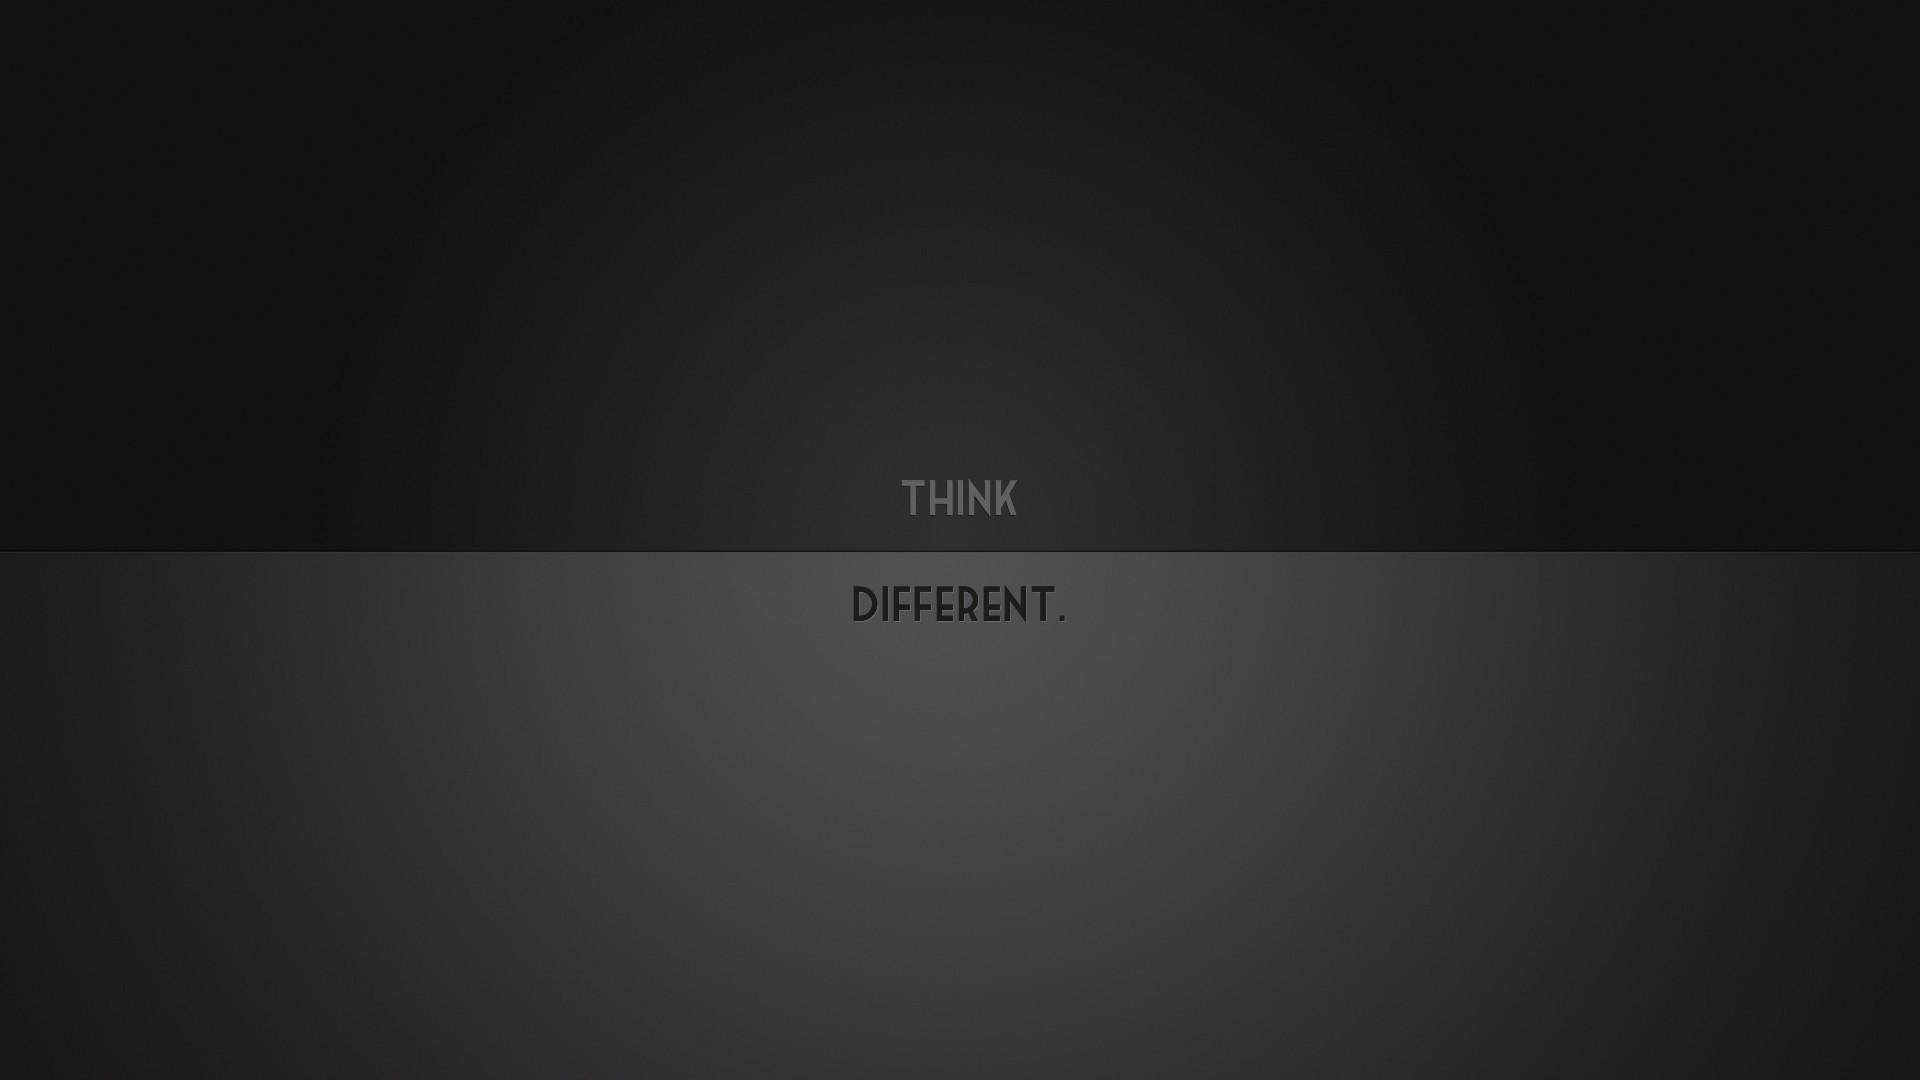 Minimalistic Think Different desktop PC and Mac wallpaper